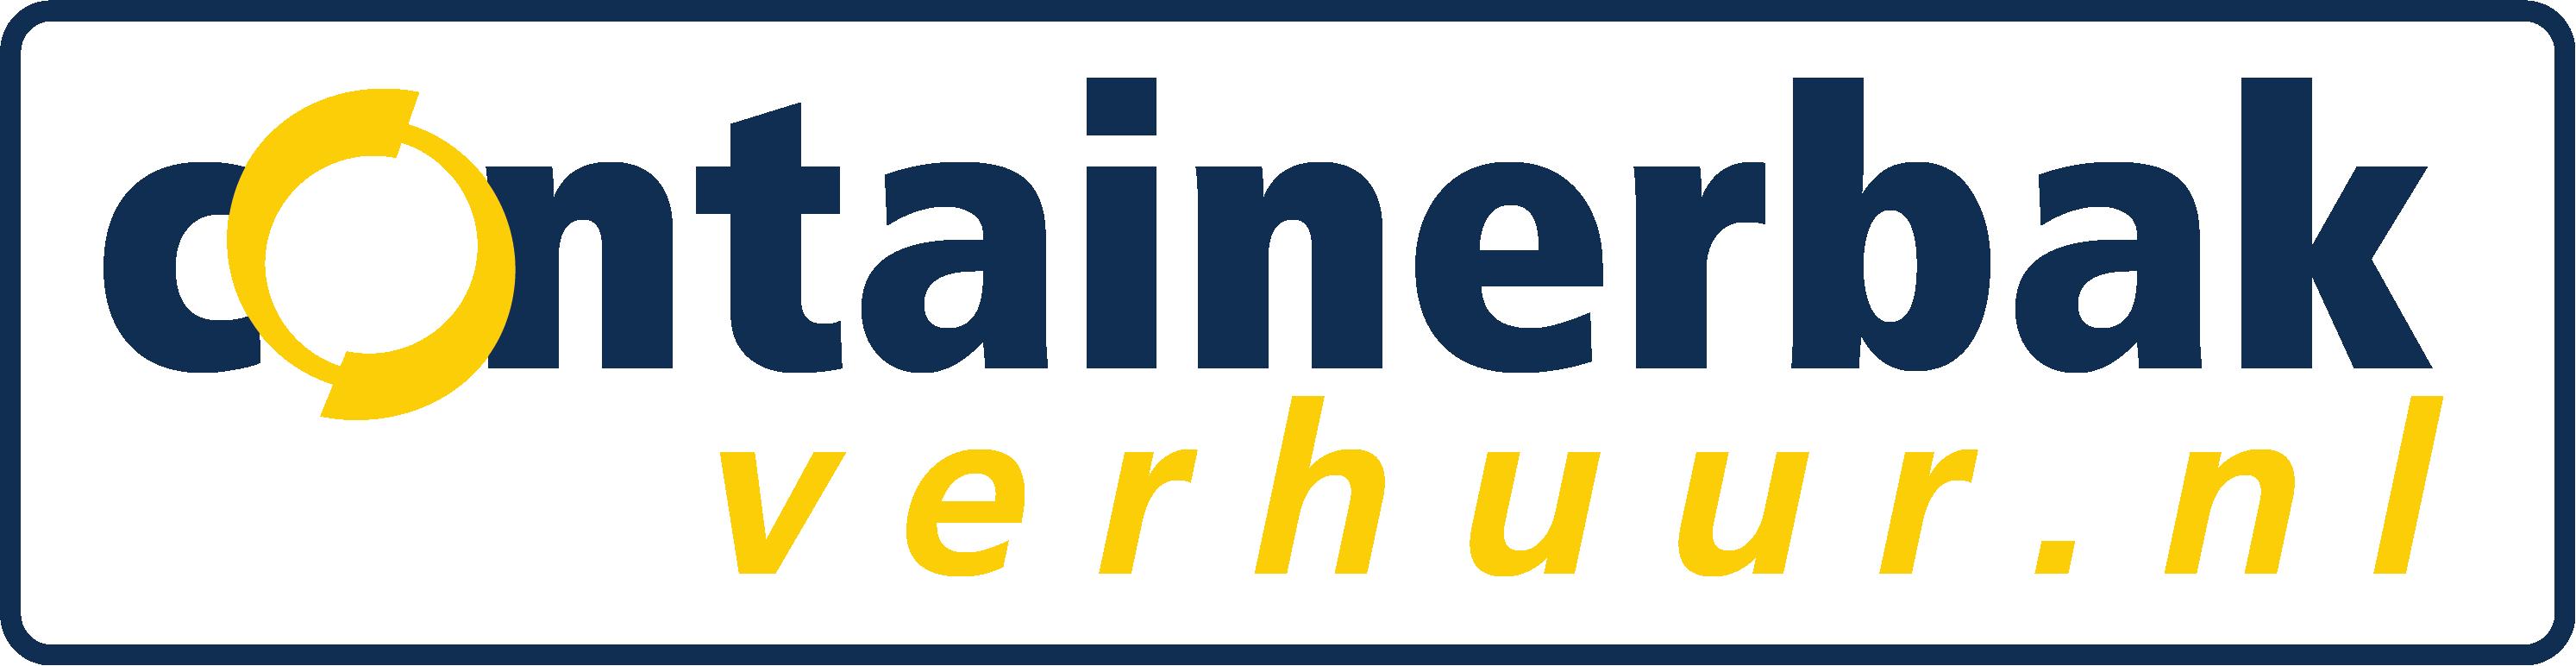 Containerbakverhuur_logo